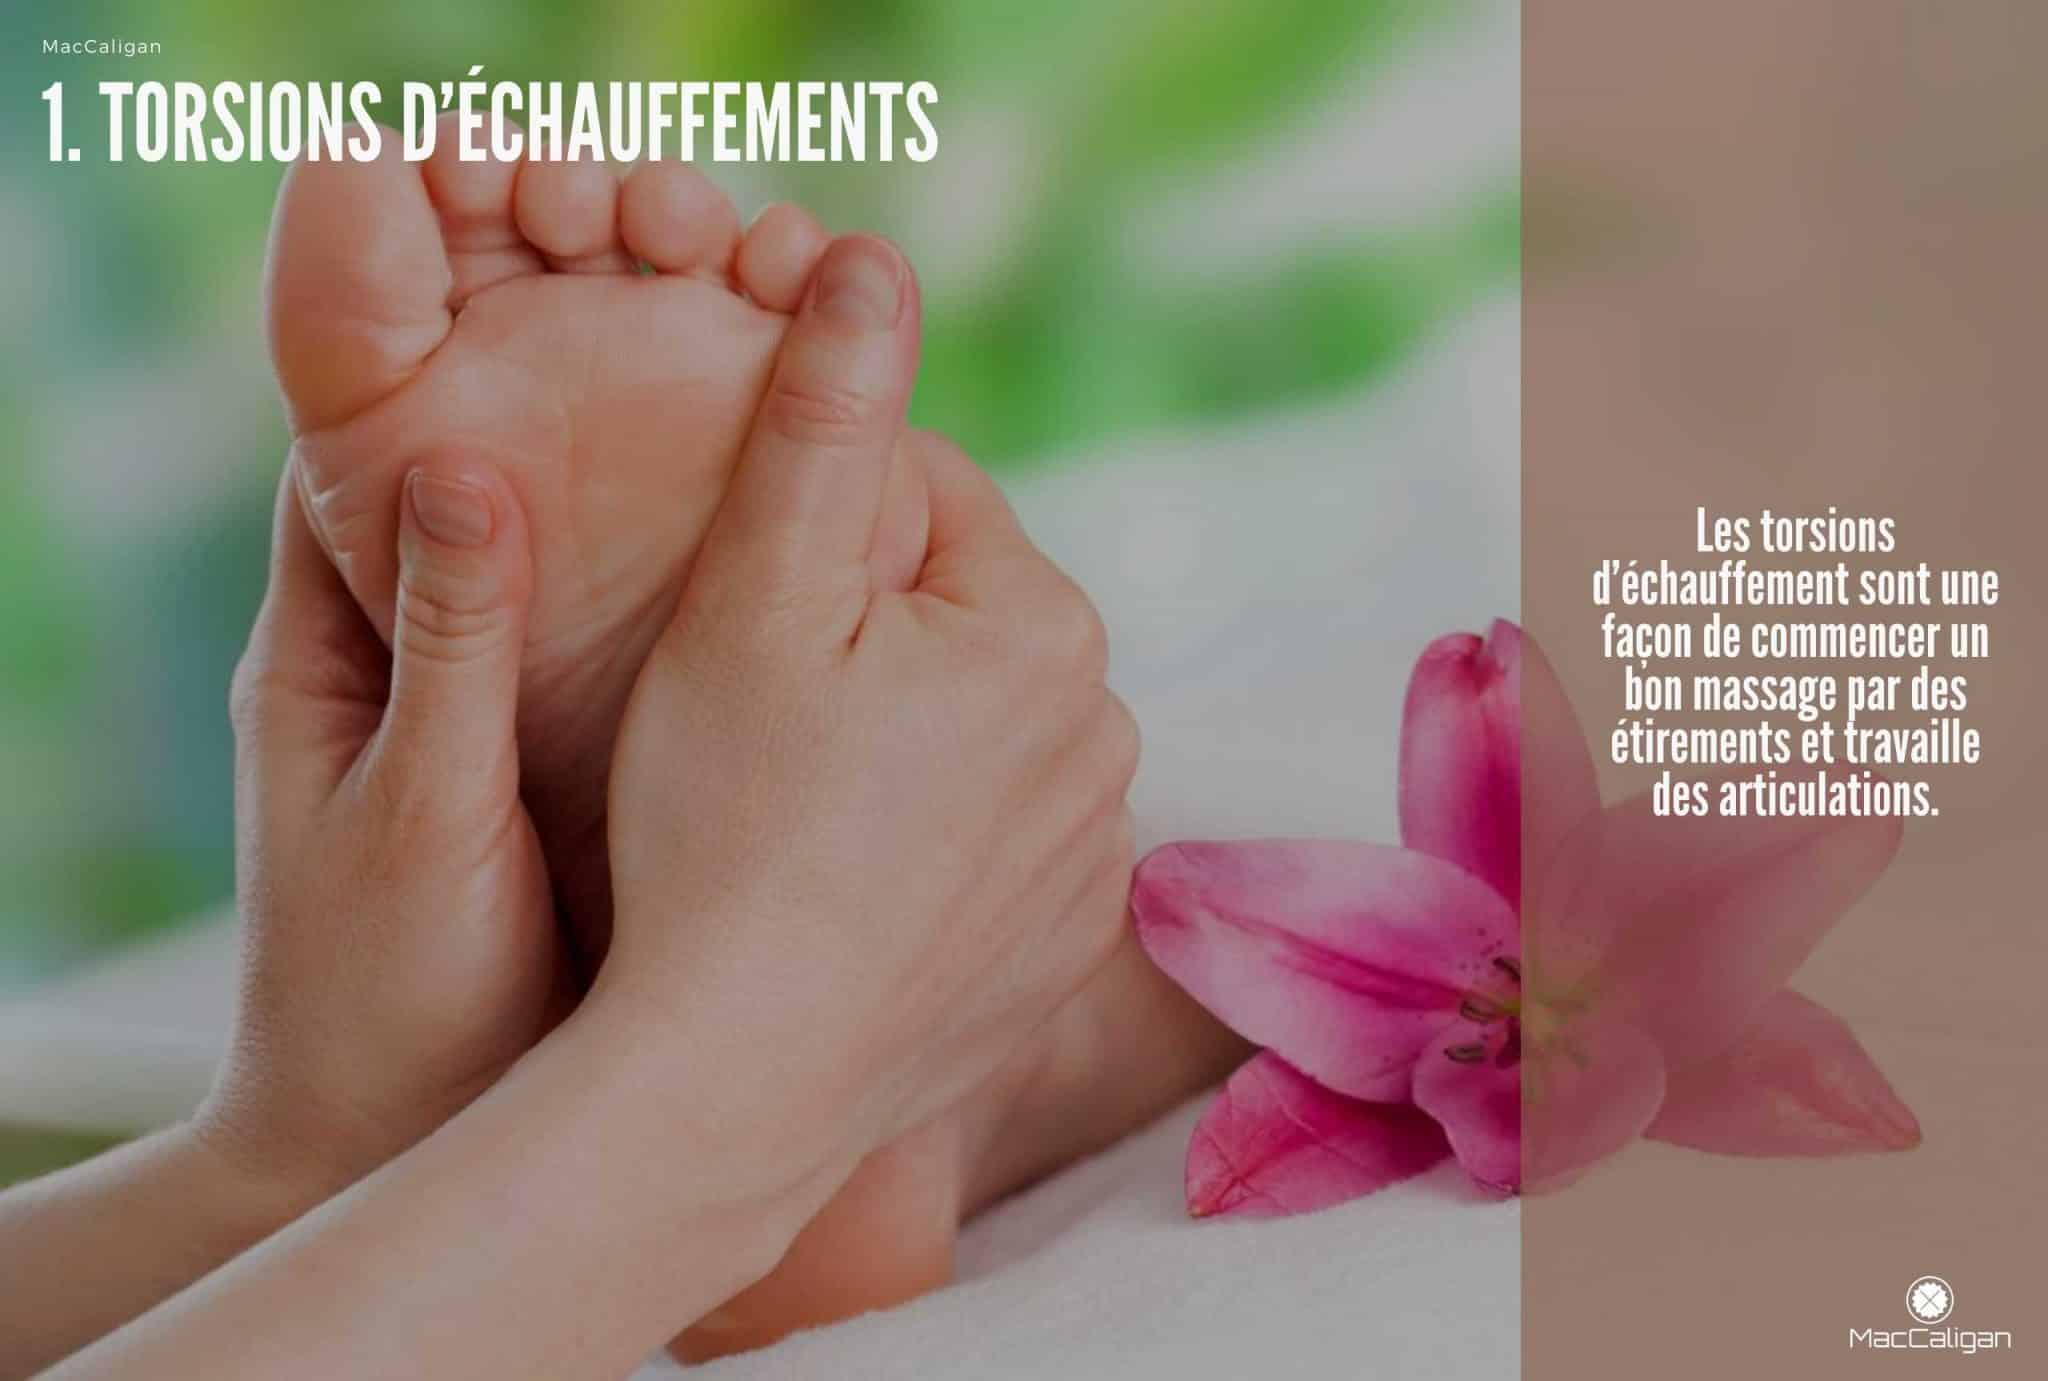 appareil massage pieds circulation - 1. TORSIONS D'ÉCHAUFFEMENTS